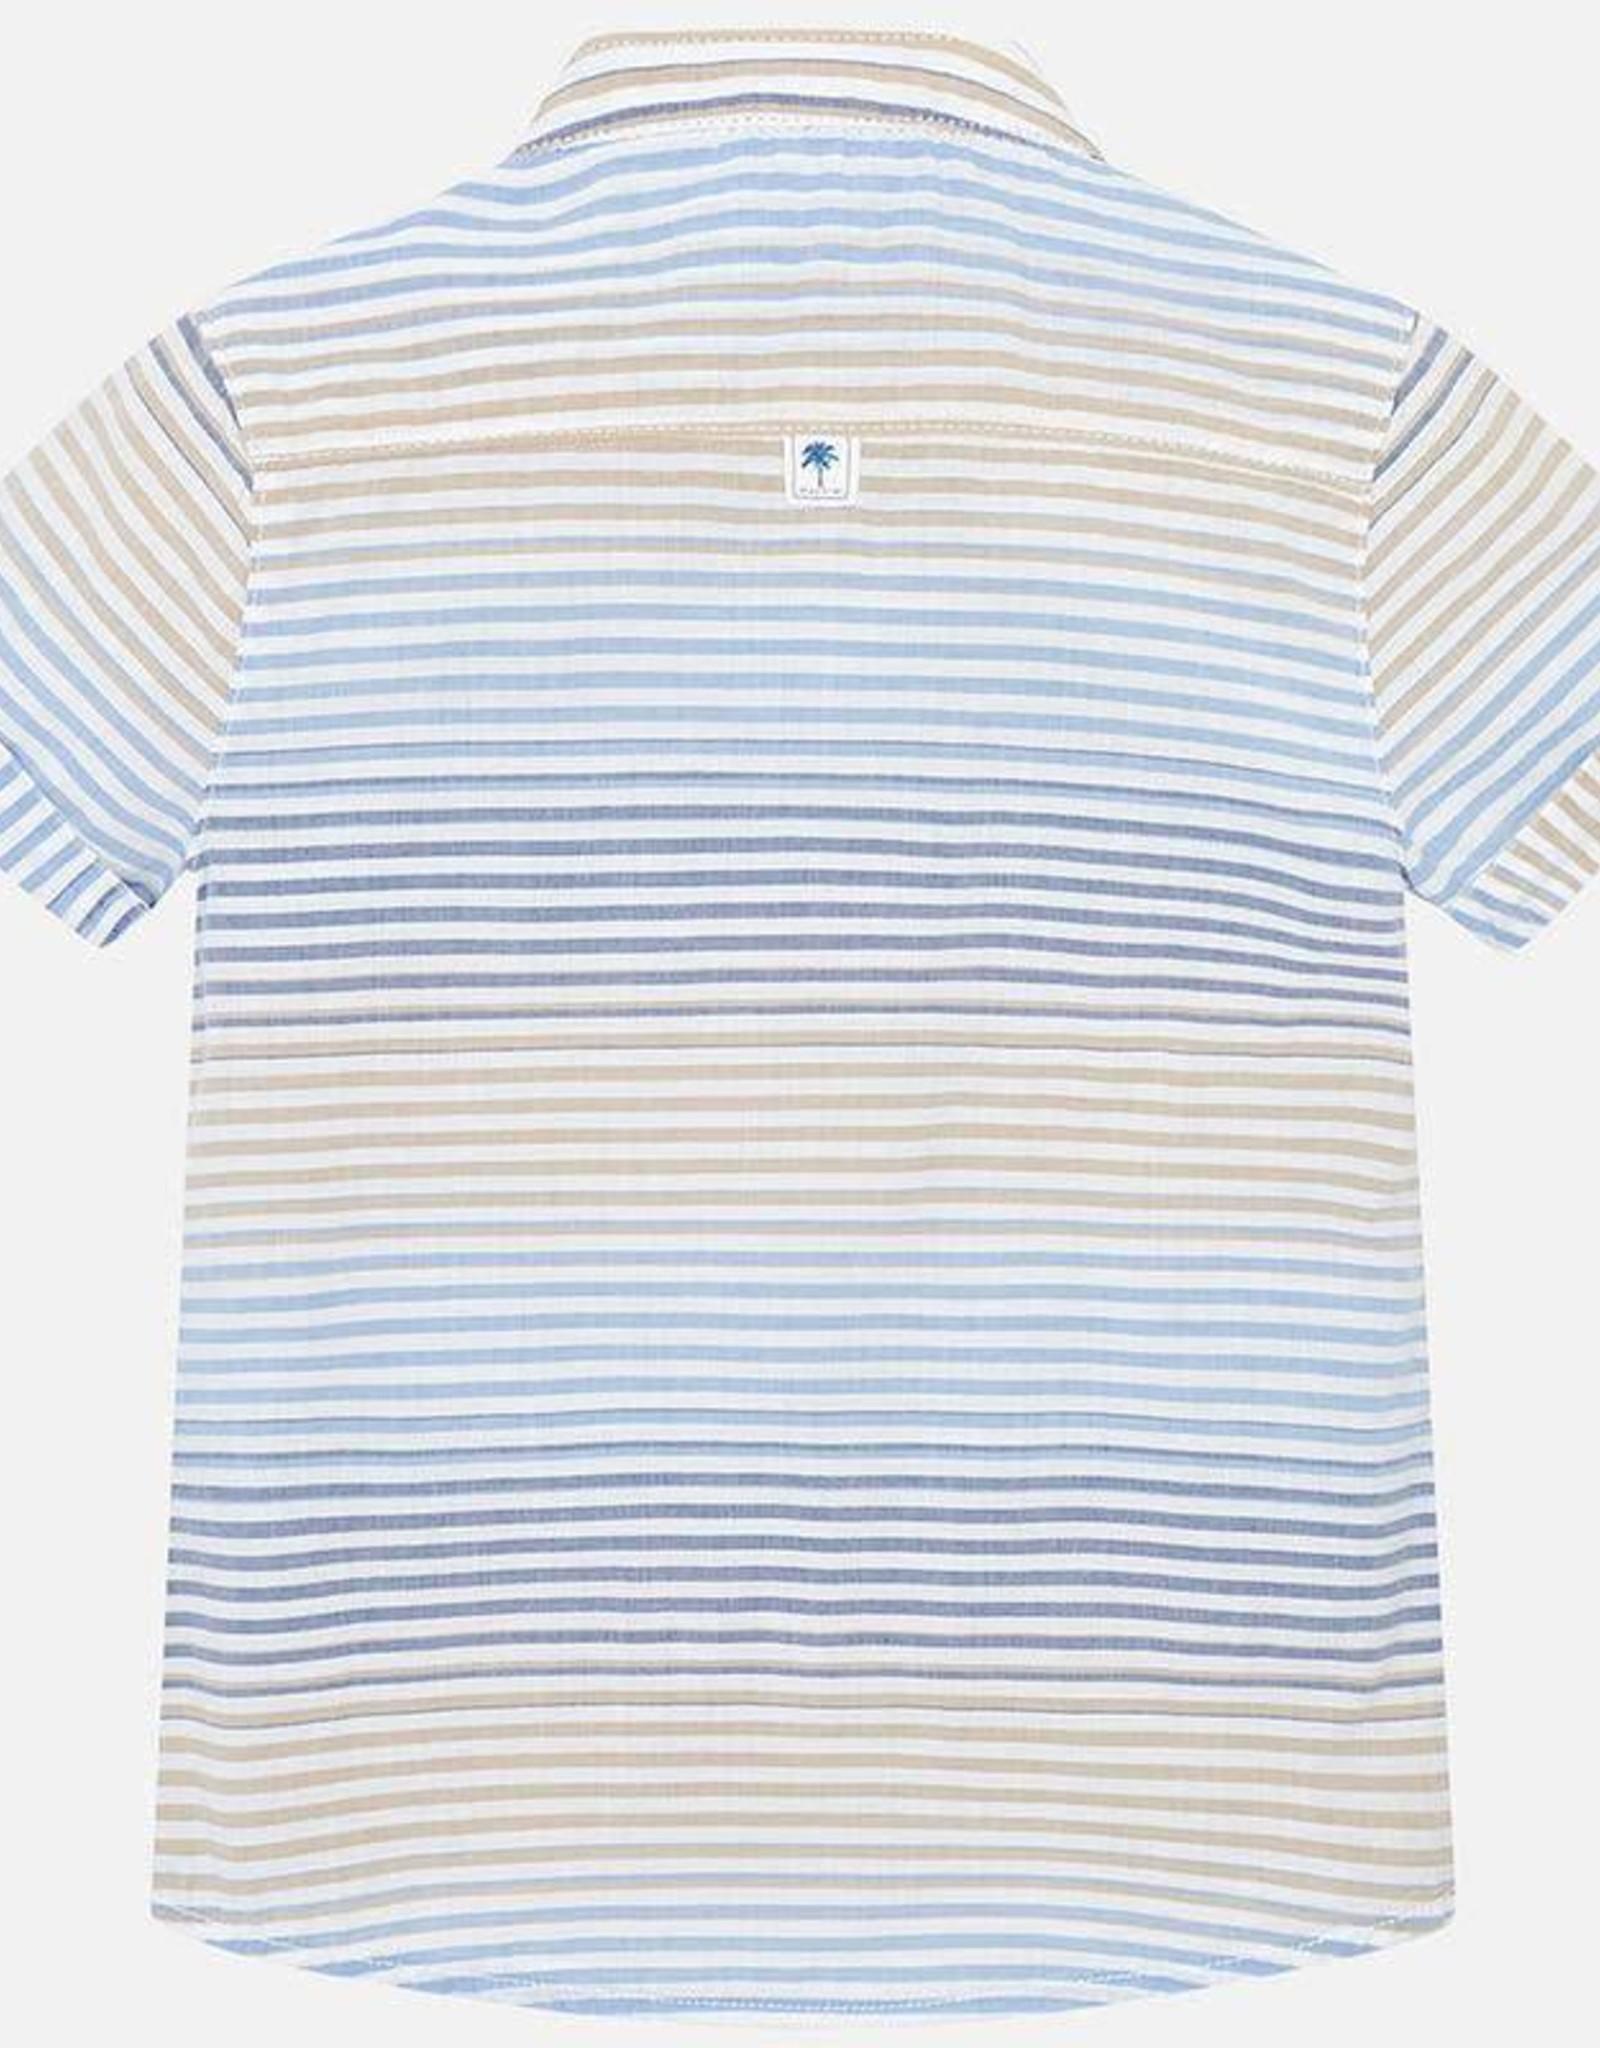 Mayoral Striped Mao Collar Shirt